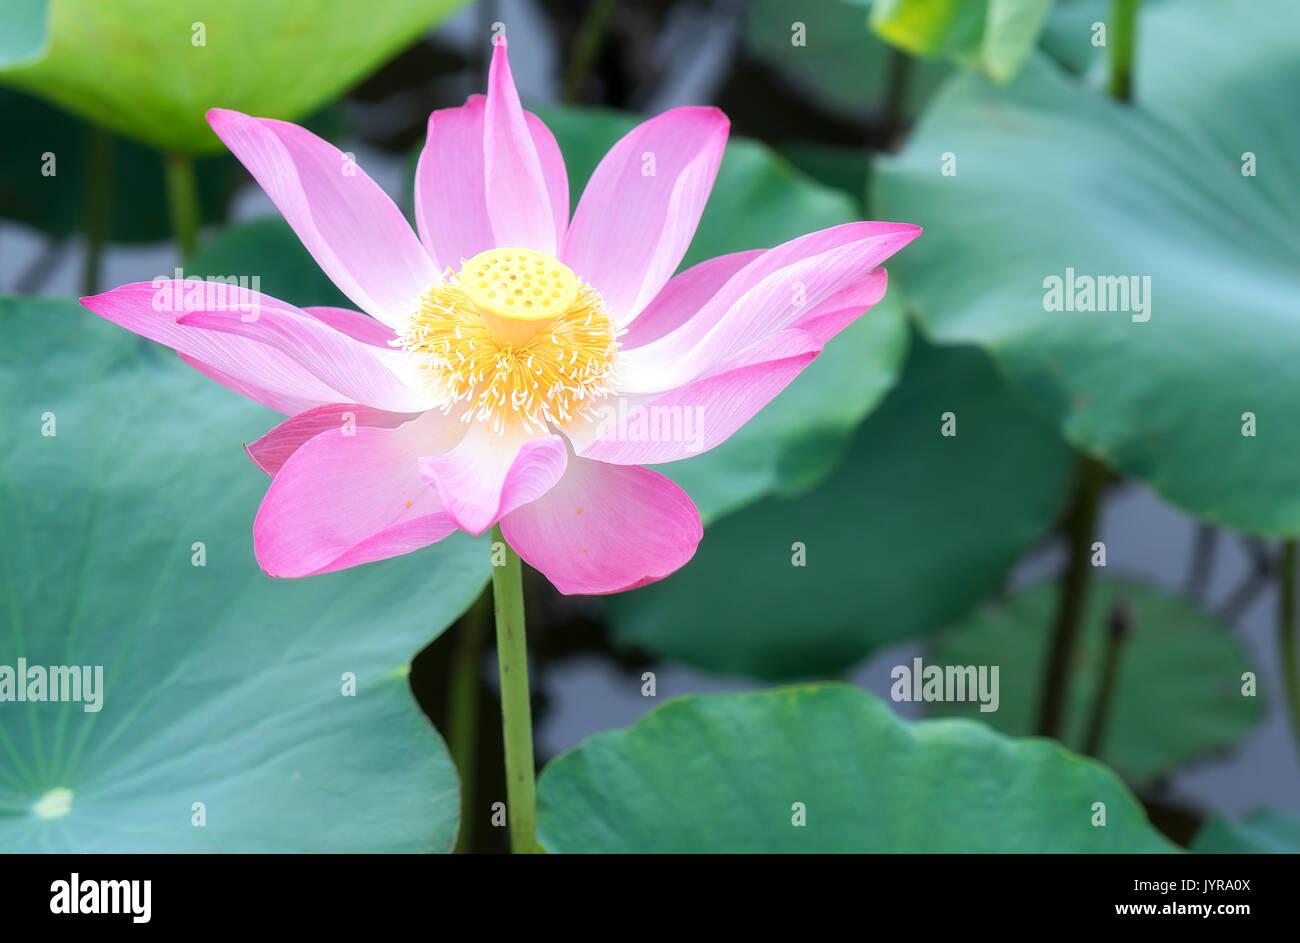 Lotus Flower In Sunlight Stock Photos Lotus Flower In Sunlight